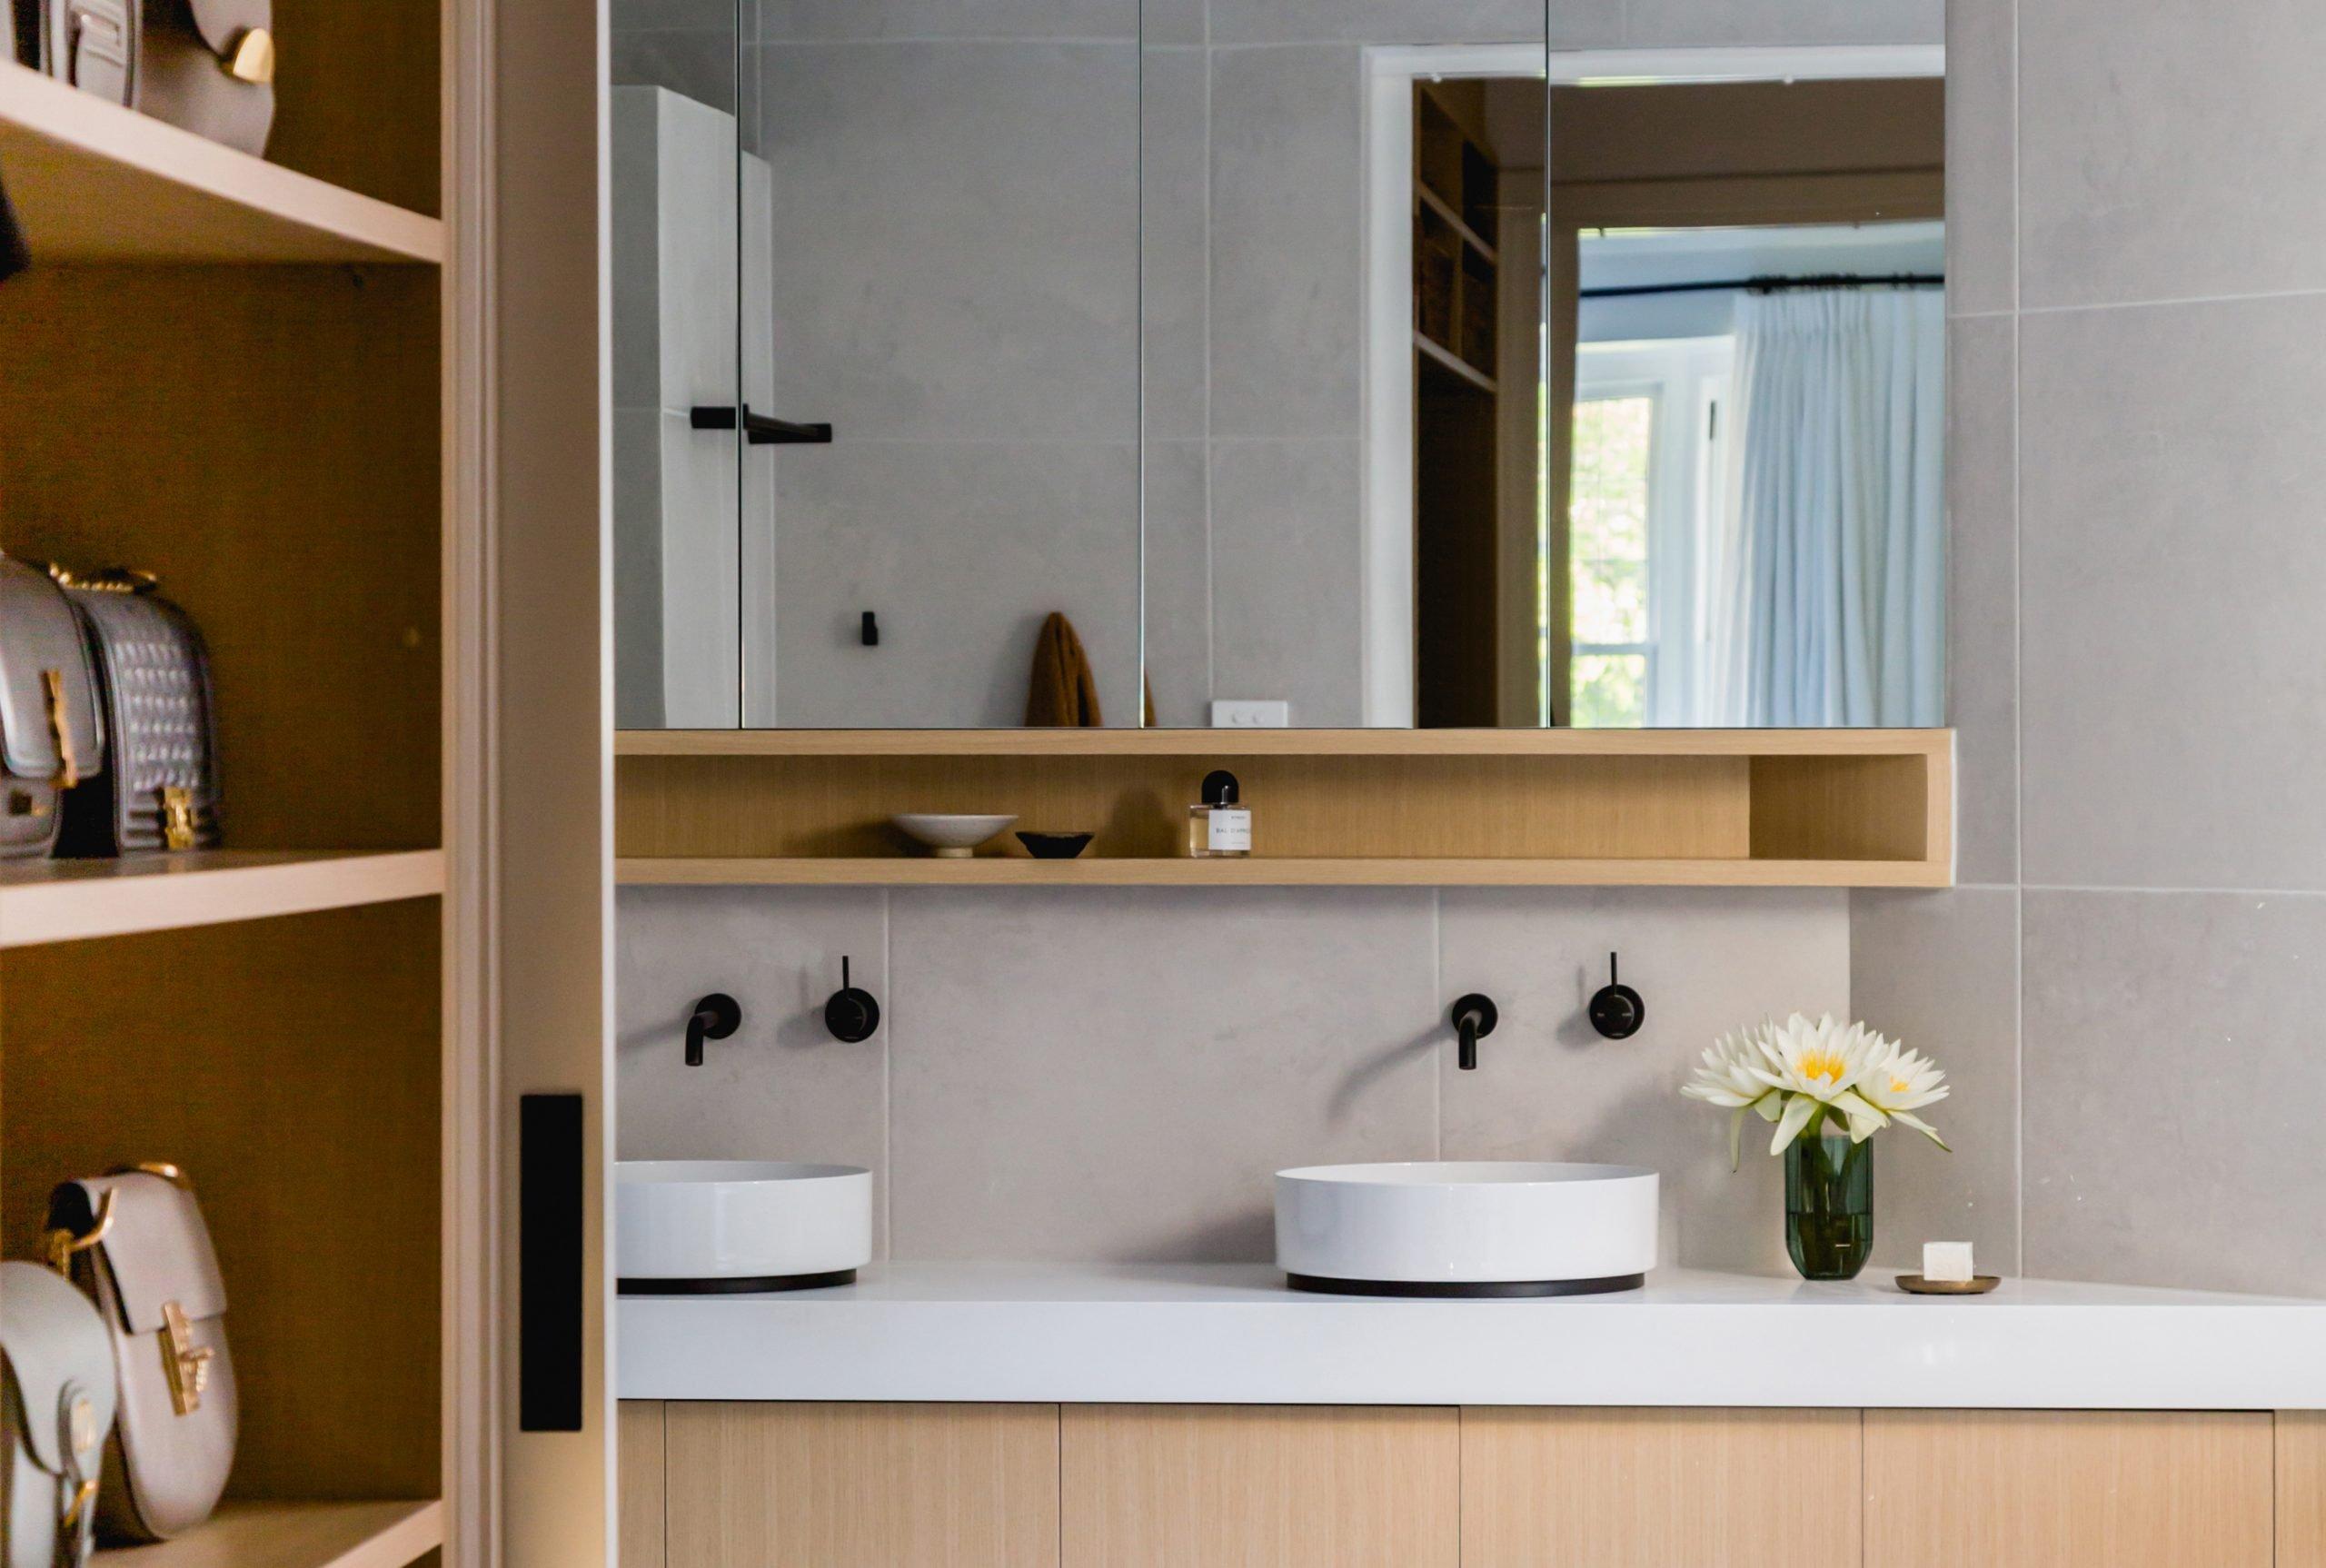 Malvern_East-Glenbrook_Ave-Bathroom-02a